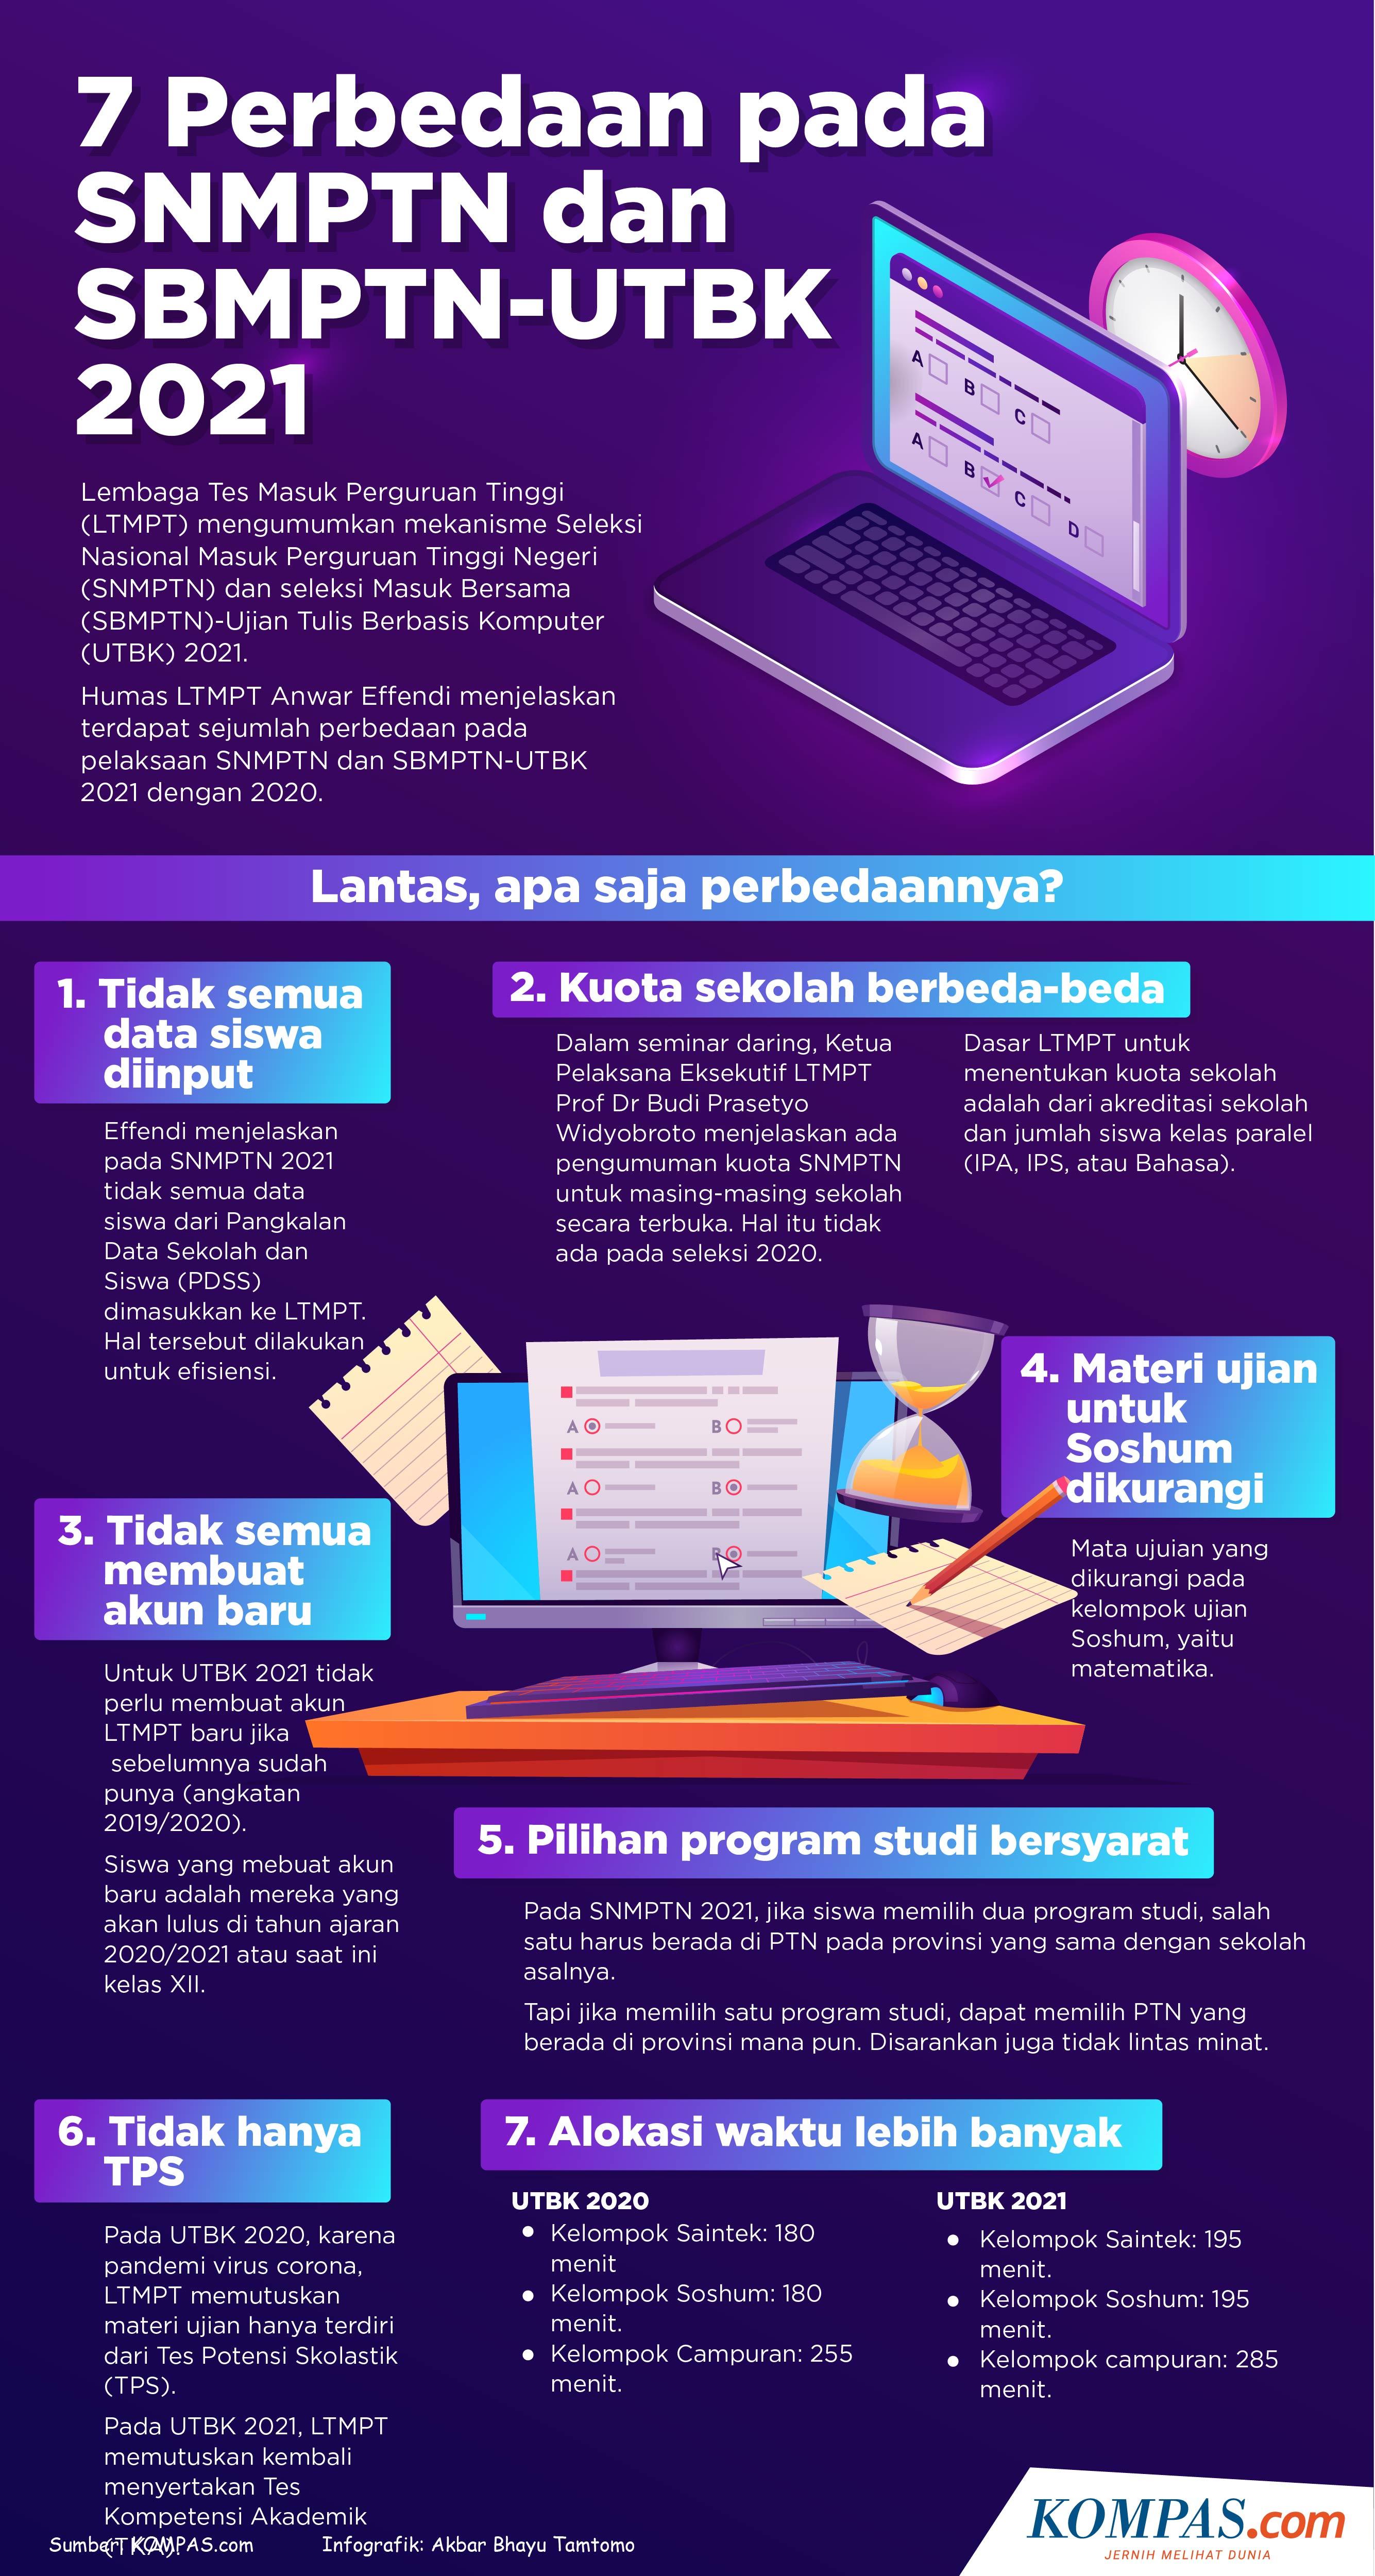 6 Langkah Pendaftaran Utbk Sbmptn 2021 Login Di Portal Ltmpt Ac Id Halaman All Kompas Com